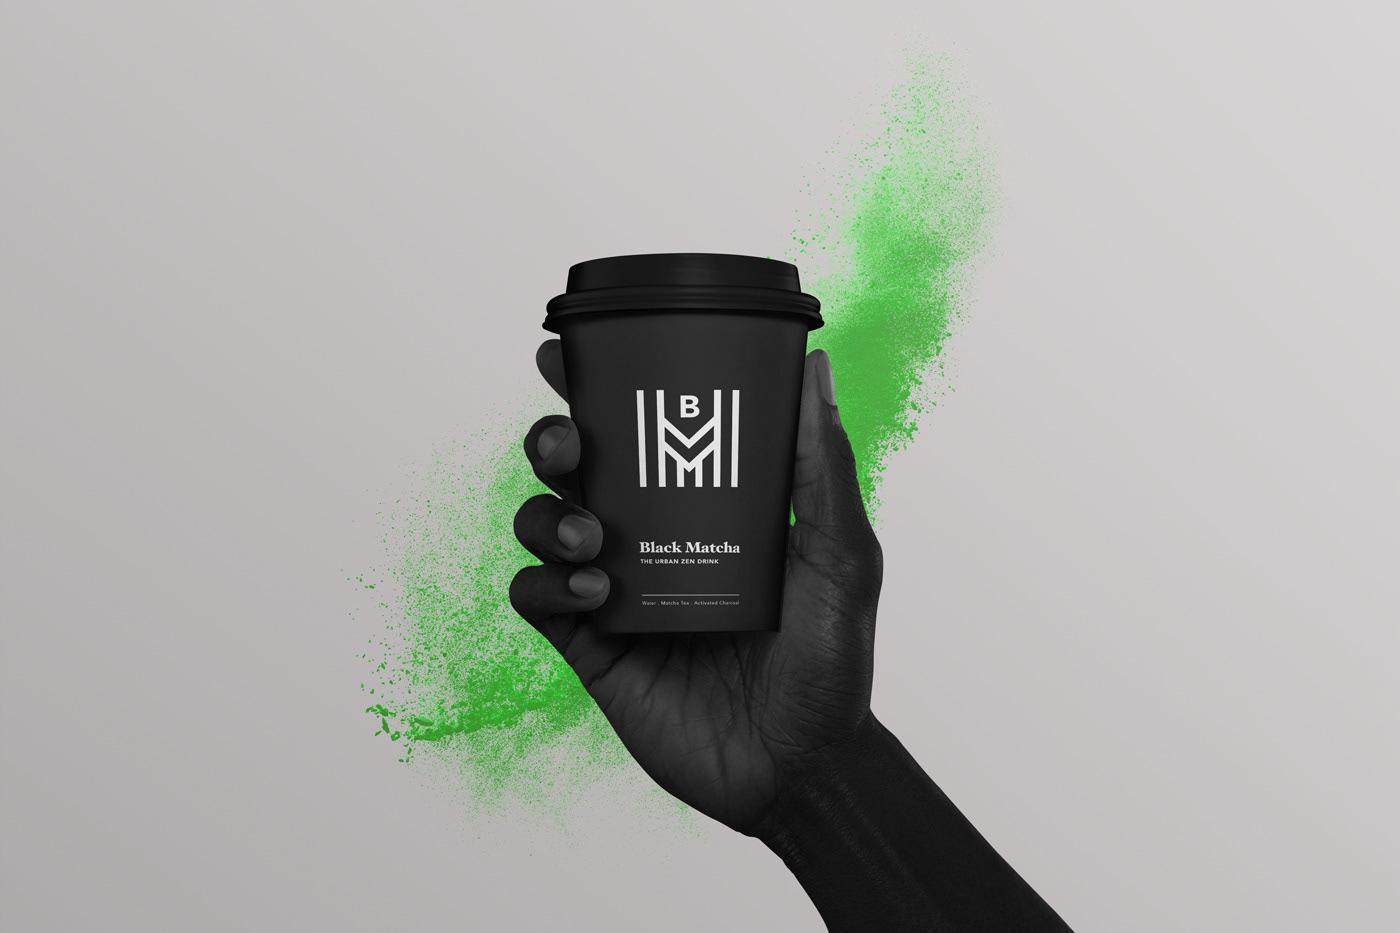 beverage black branding  concept design identity Identity Design matcha Packaging product design